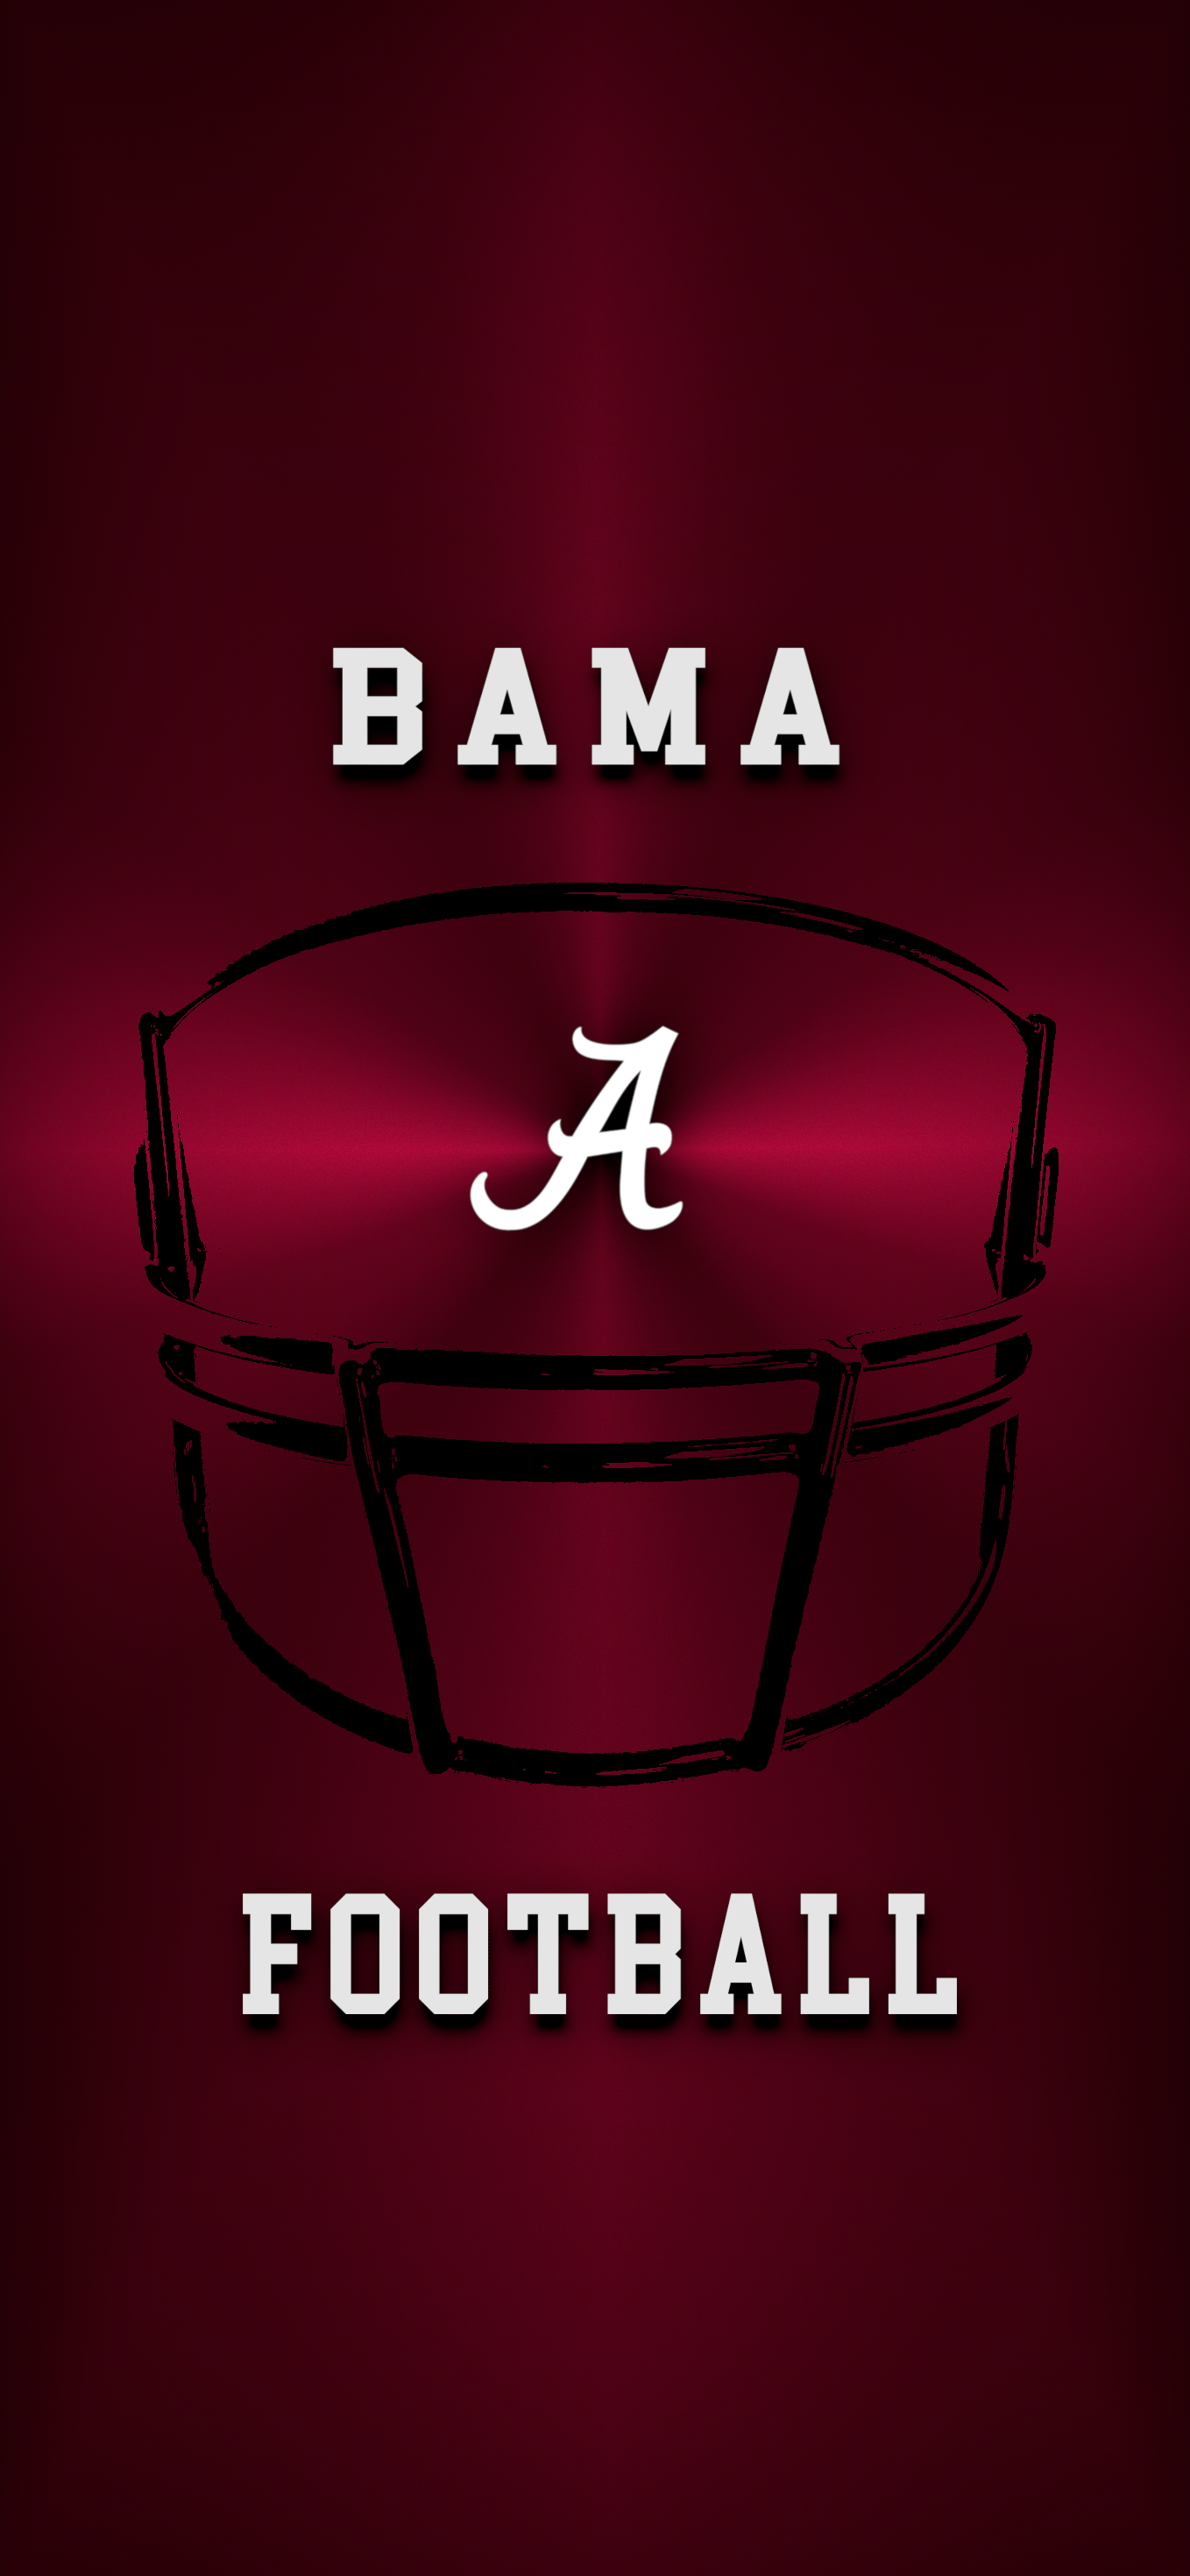 Bama Football Metal Alabama Crimson Tide Logo Crimson Tide Football Bama Football